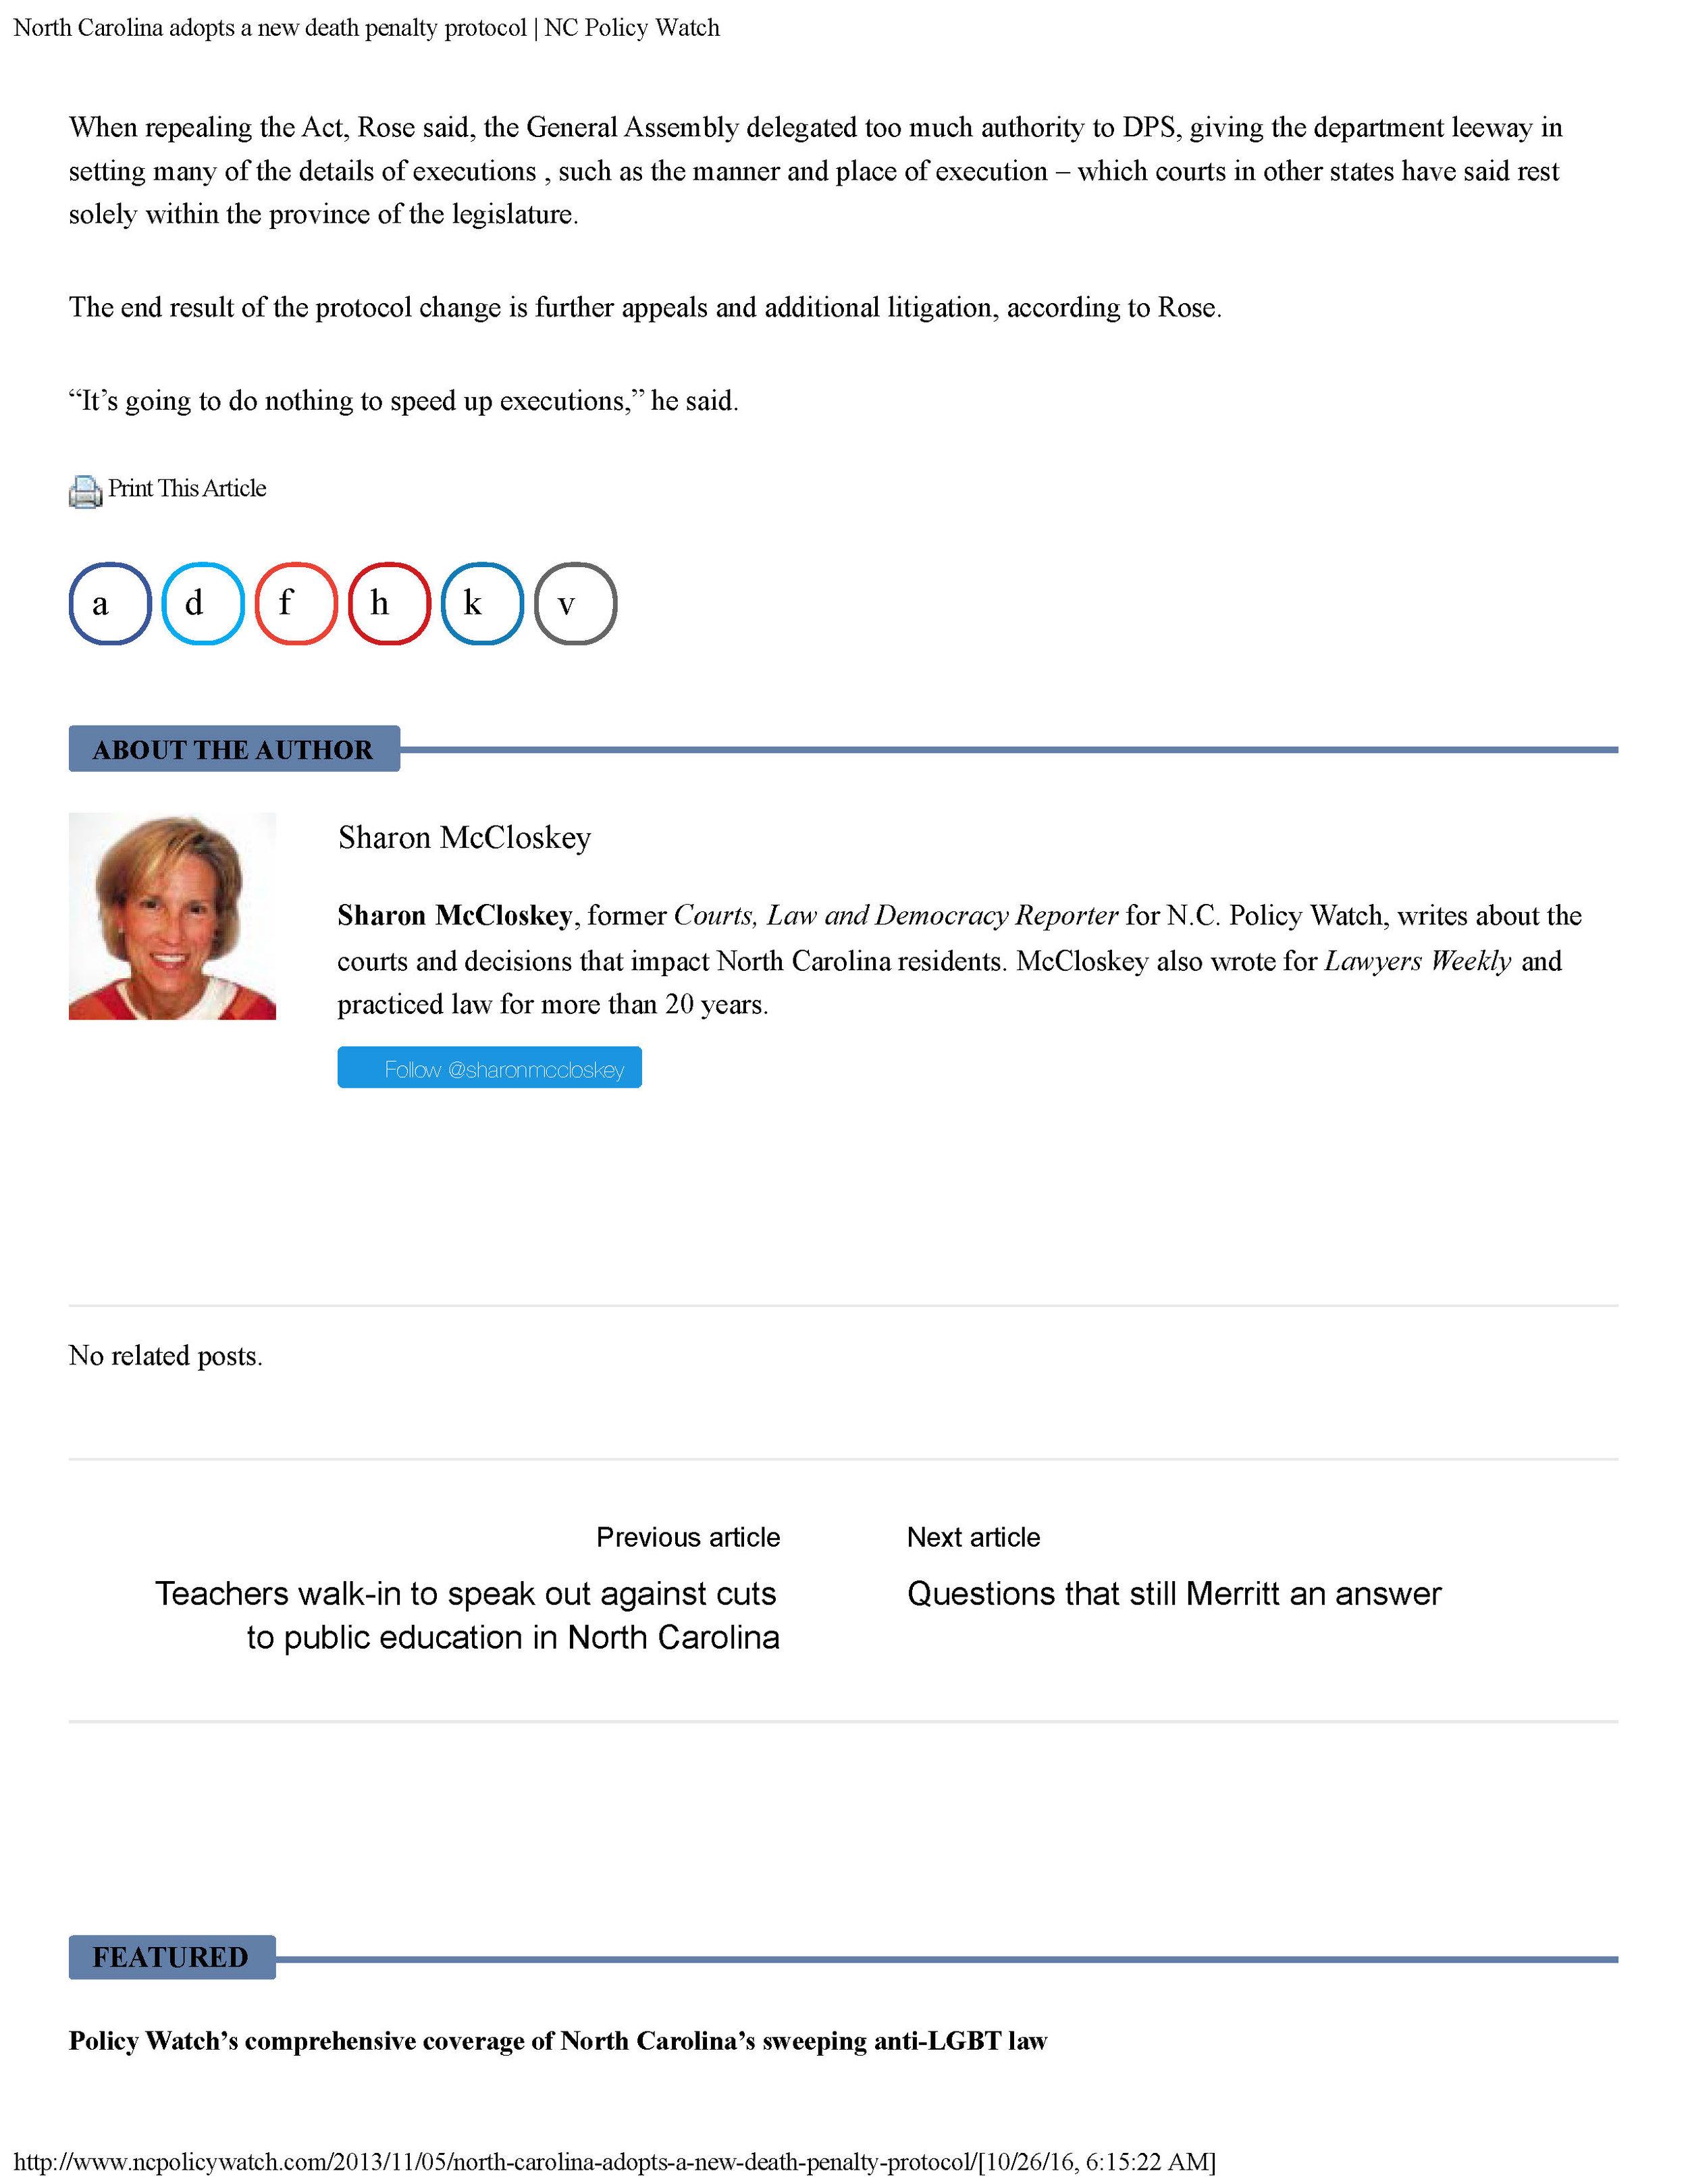 Sharon McCloskey - North Carolina adopts a new death penalty protocol - NC Policy Watch_Page_5.jpg